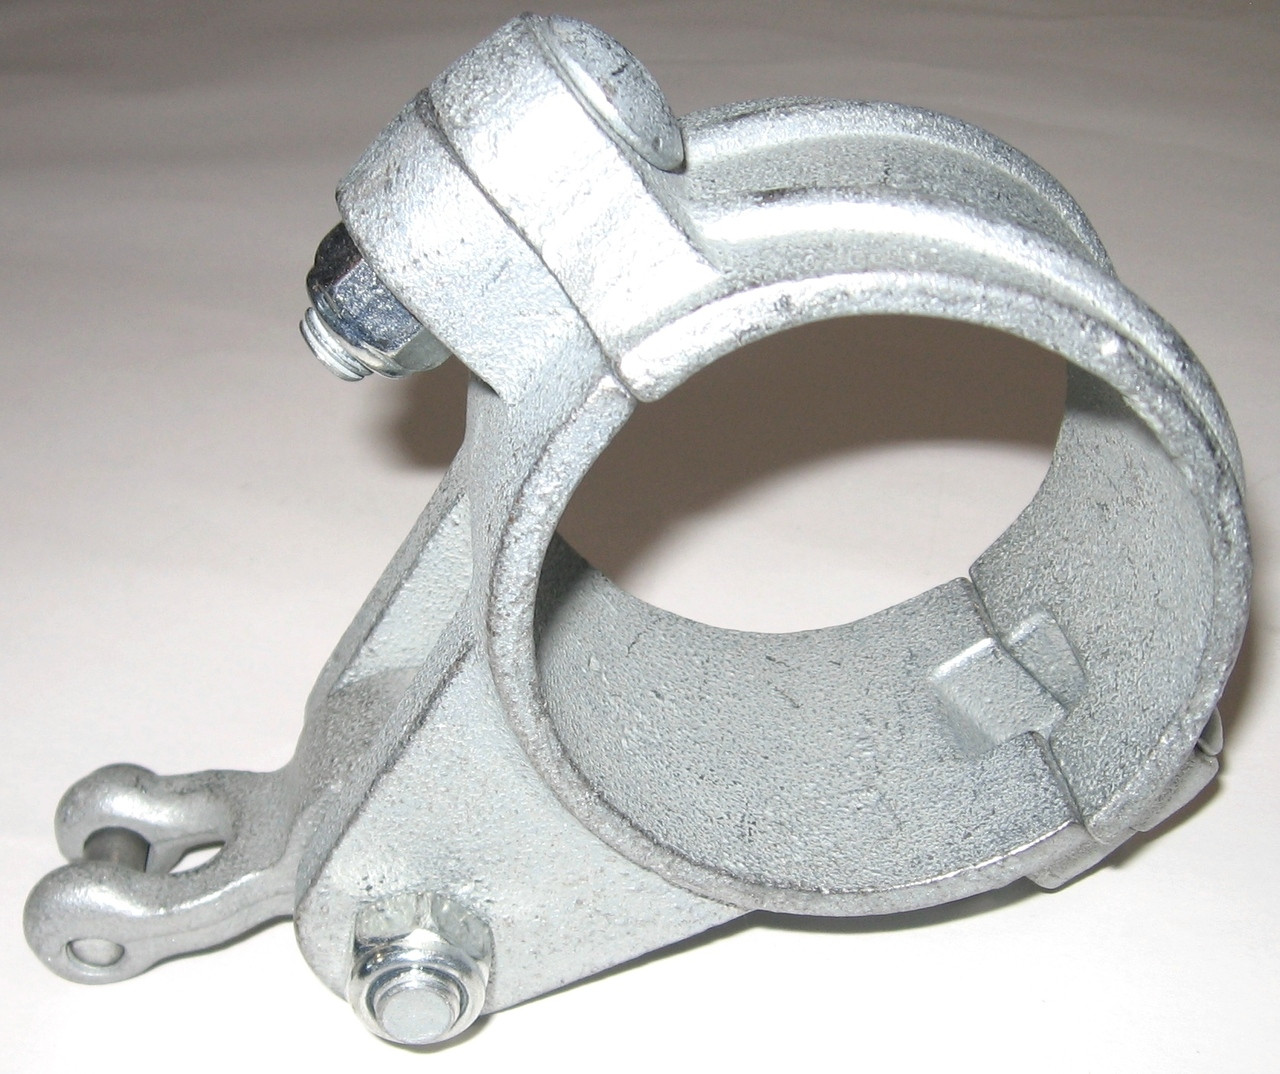 "2 3/8"" OD Ductile Iron Swing Hanger w/Shackle Pendulum"